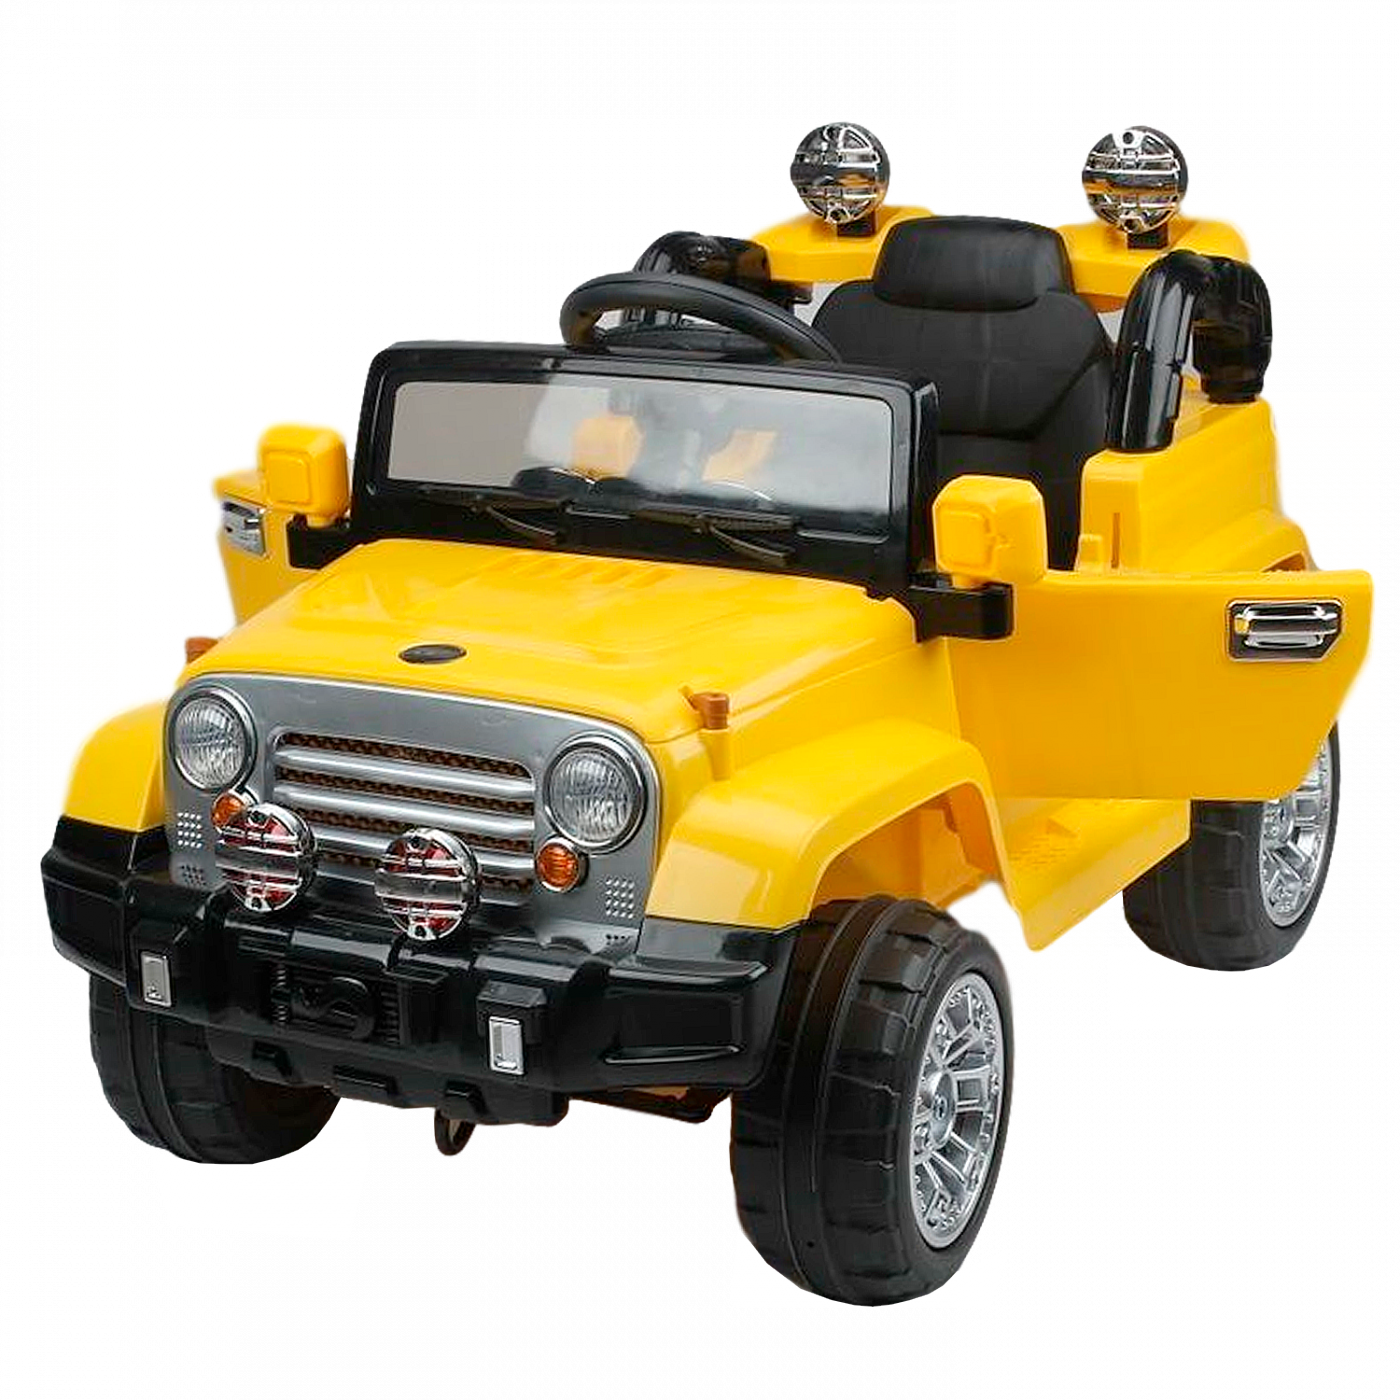 Детский электромобиль (2020) JJ245 (12V, EVA) жёлтый